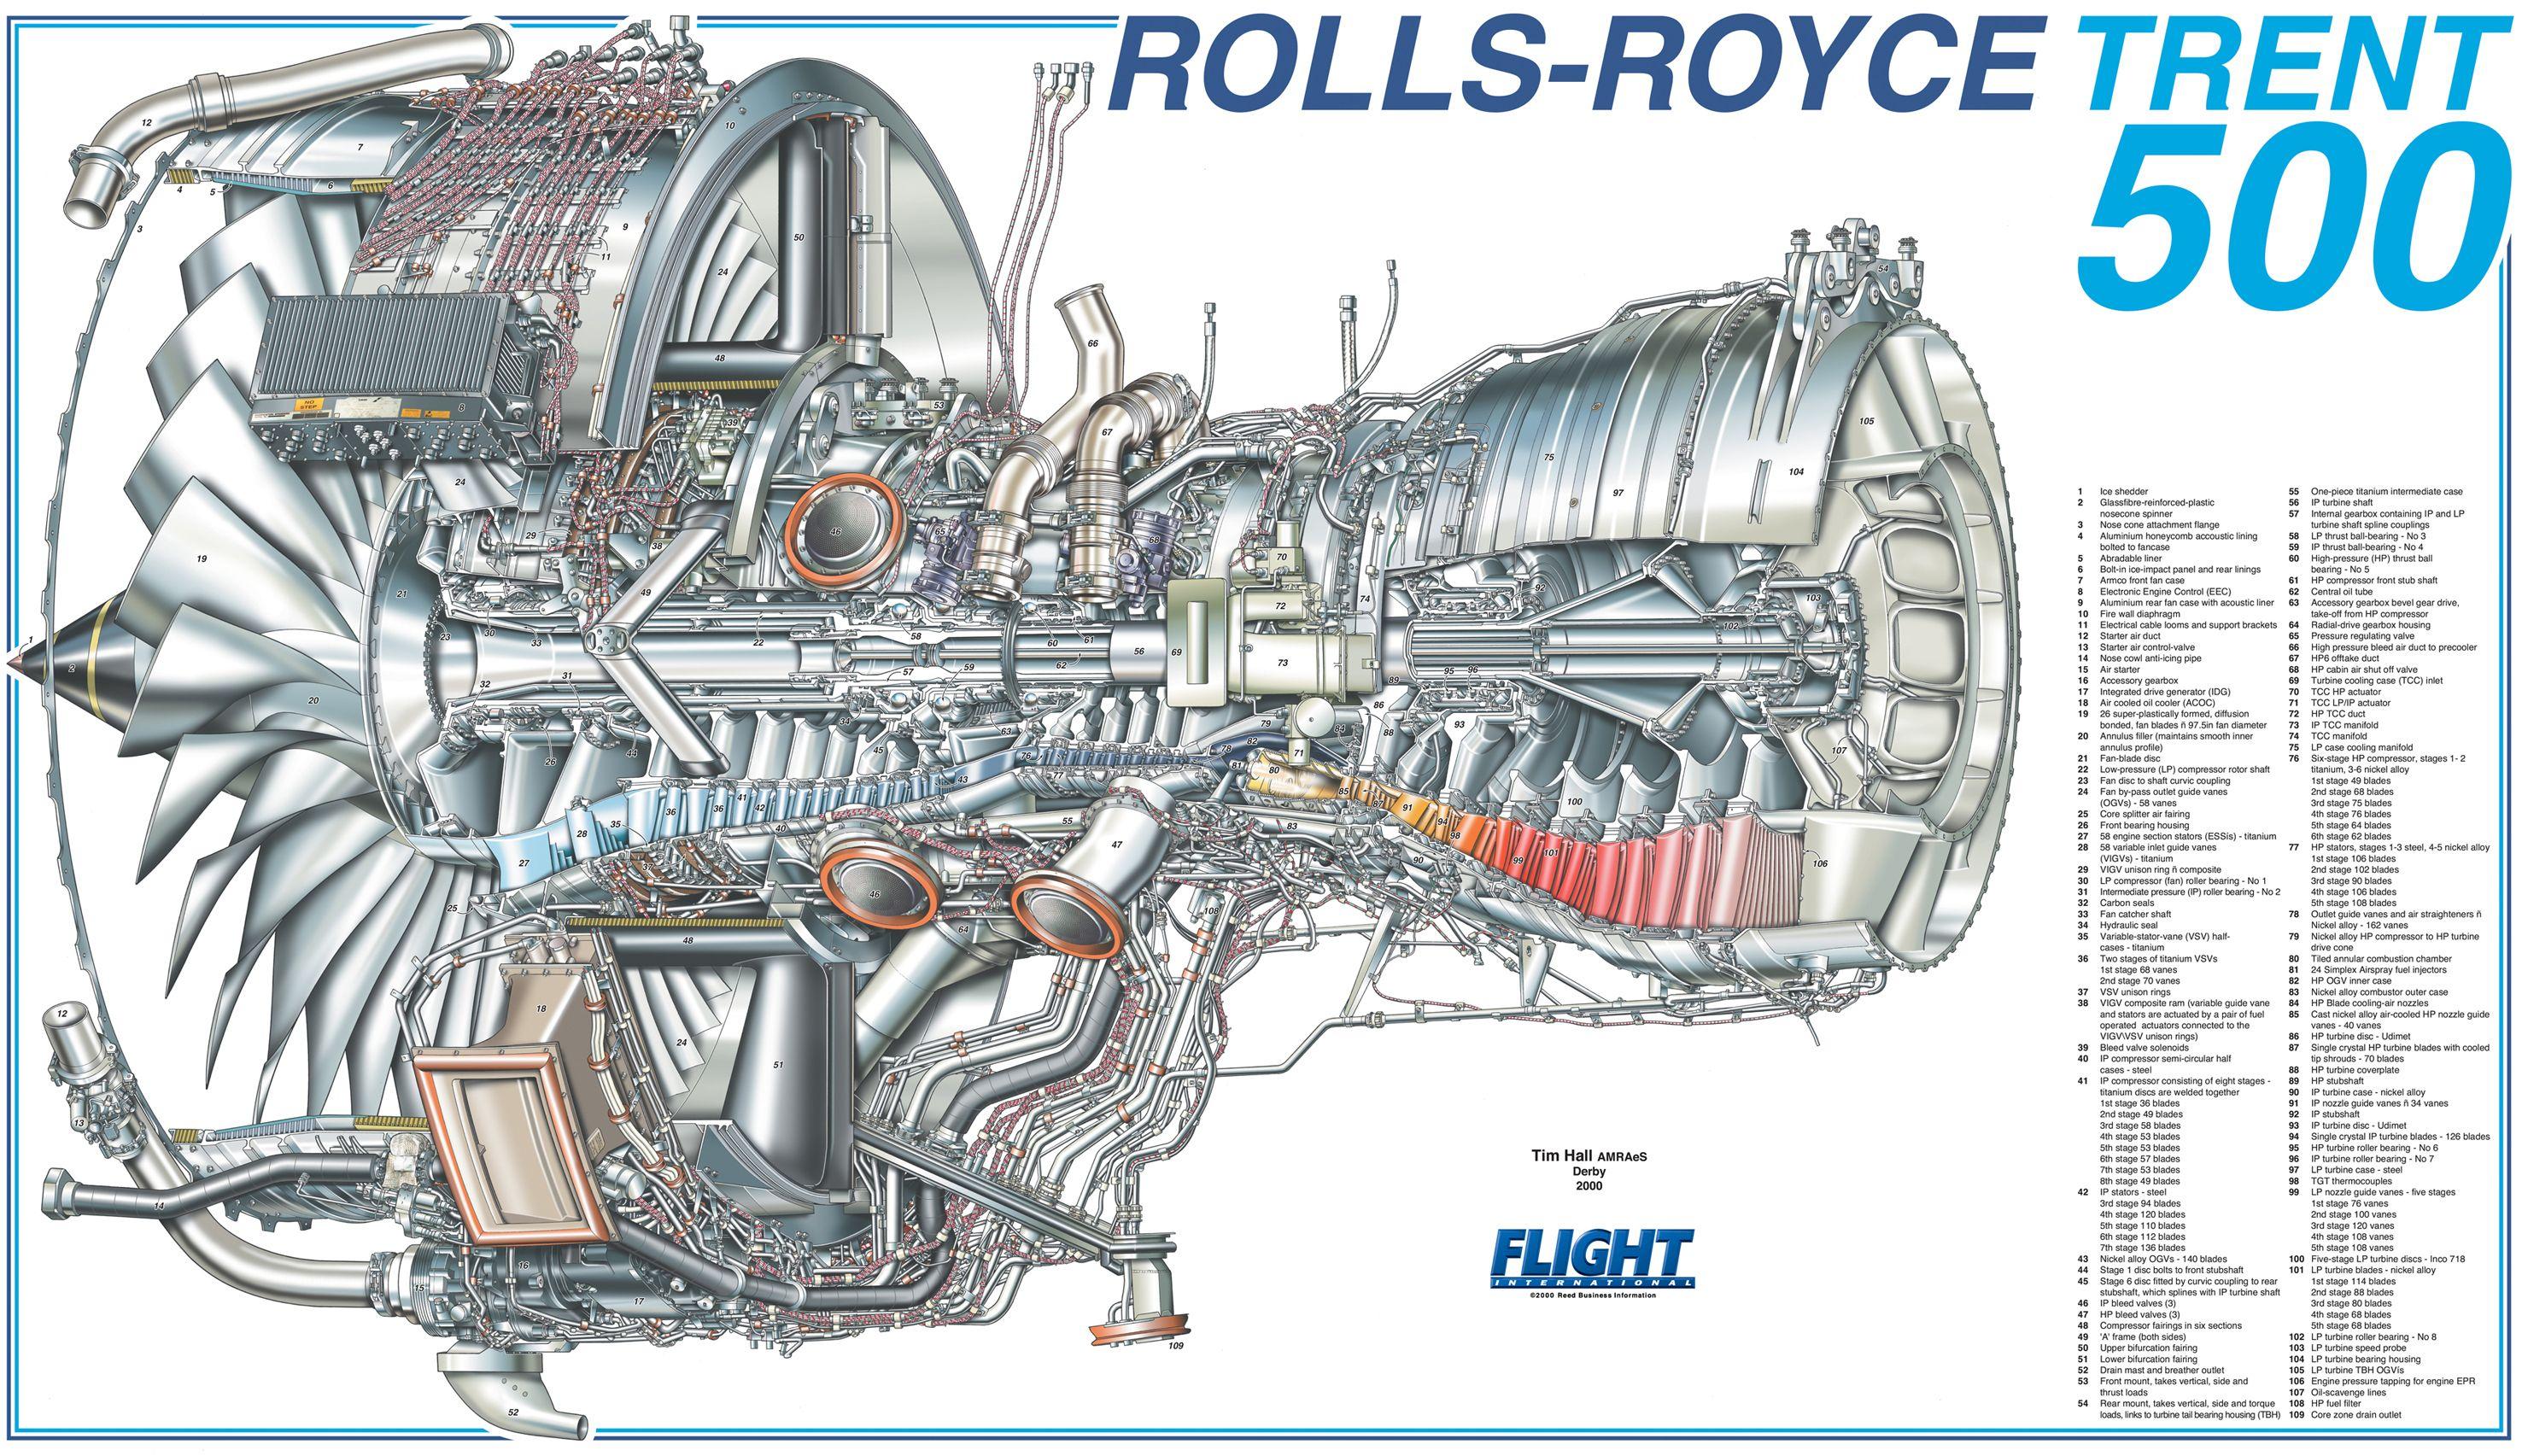 Pin by Thigabore on Aeroengine Rolls royce trent, Rolls